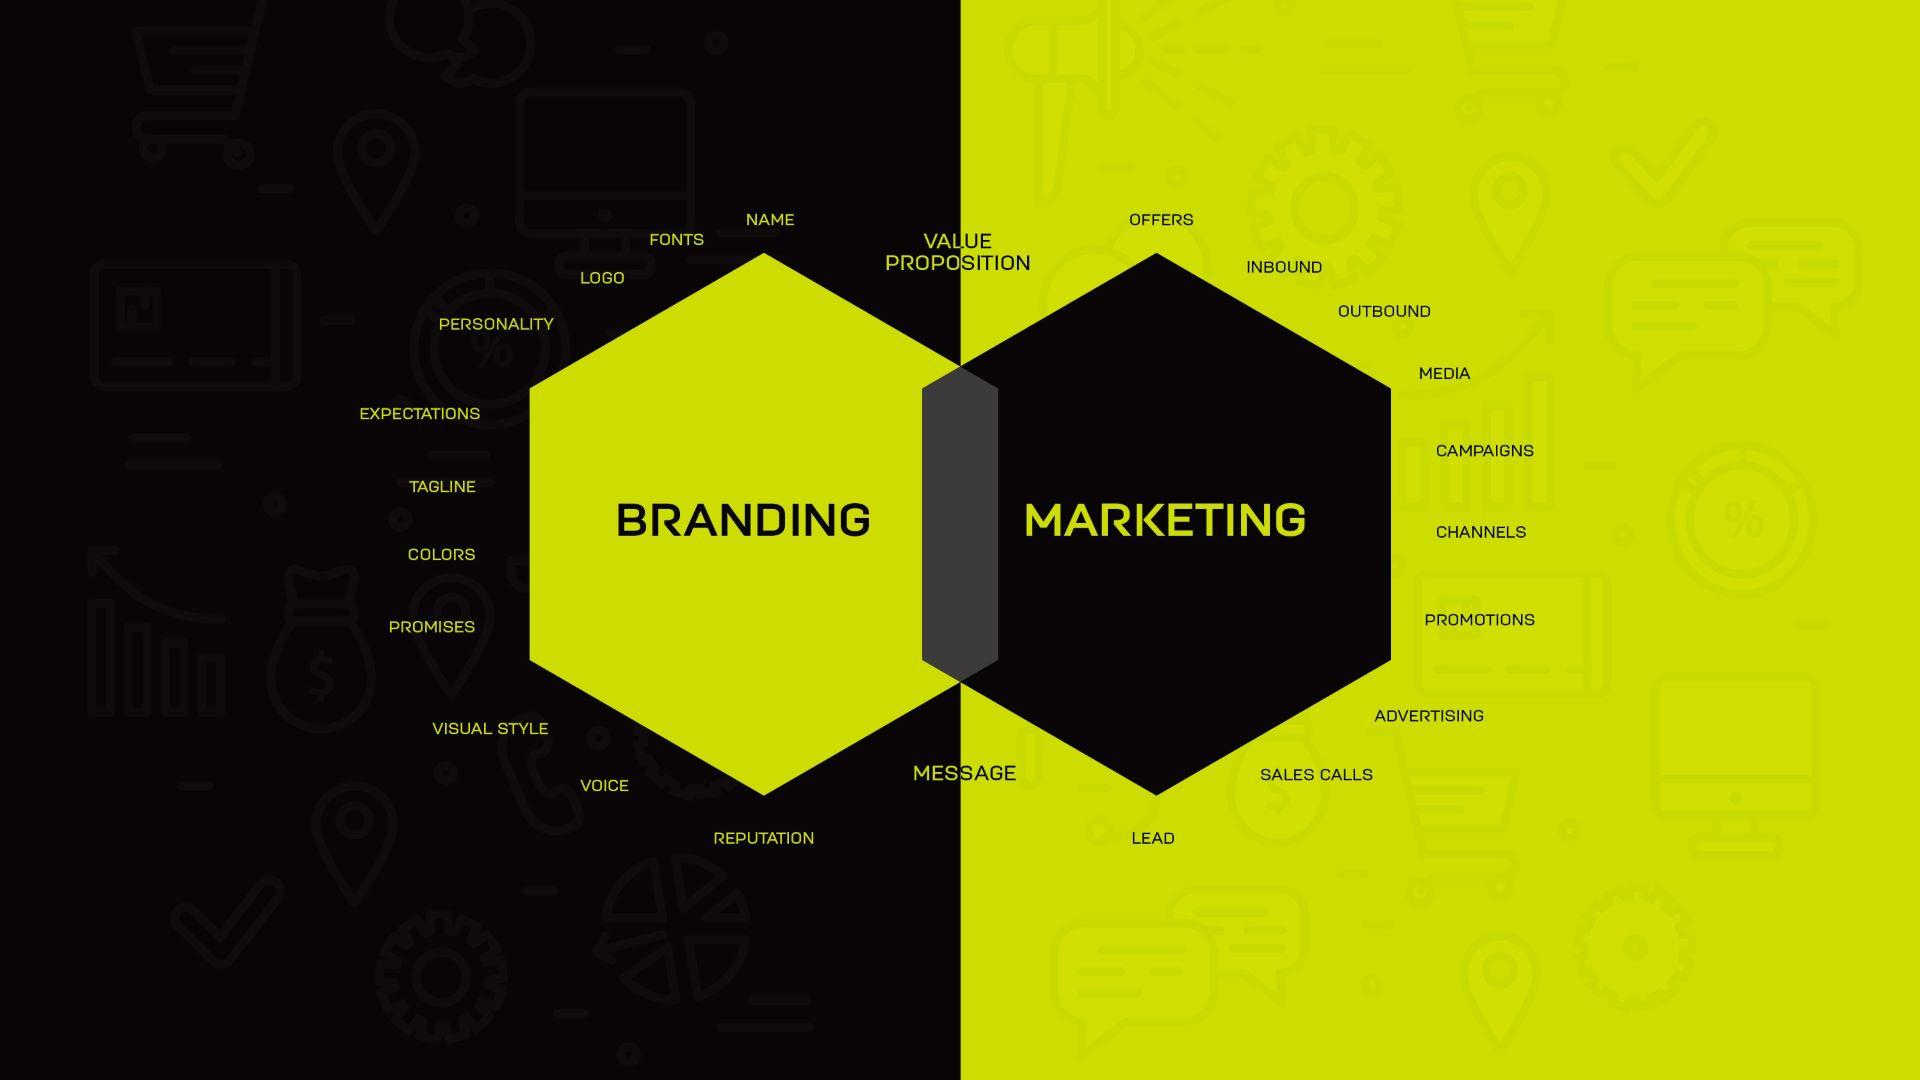 Infographic describing the intersection of branding versus marketing